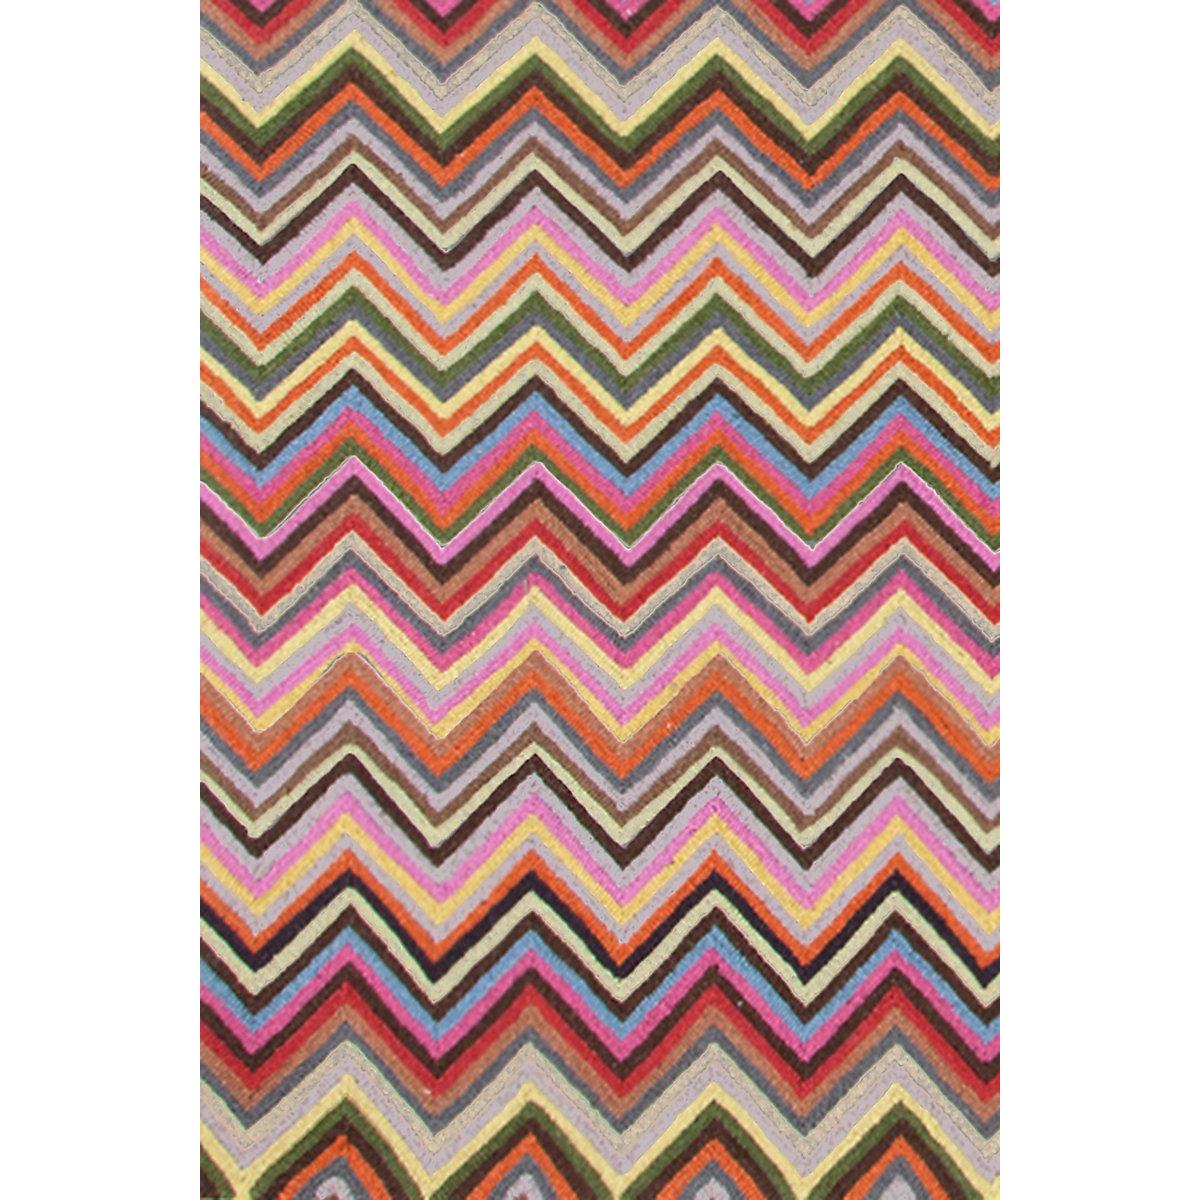 Gypsy Stripe Turquoise Grey Woven Cotton Rug: Zigzag Multi Micro Hooked Rug